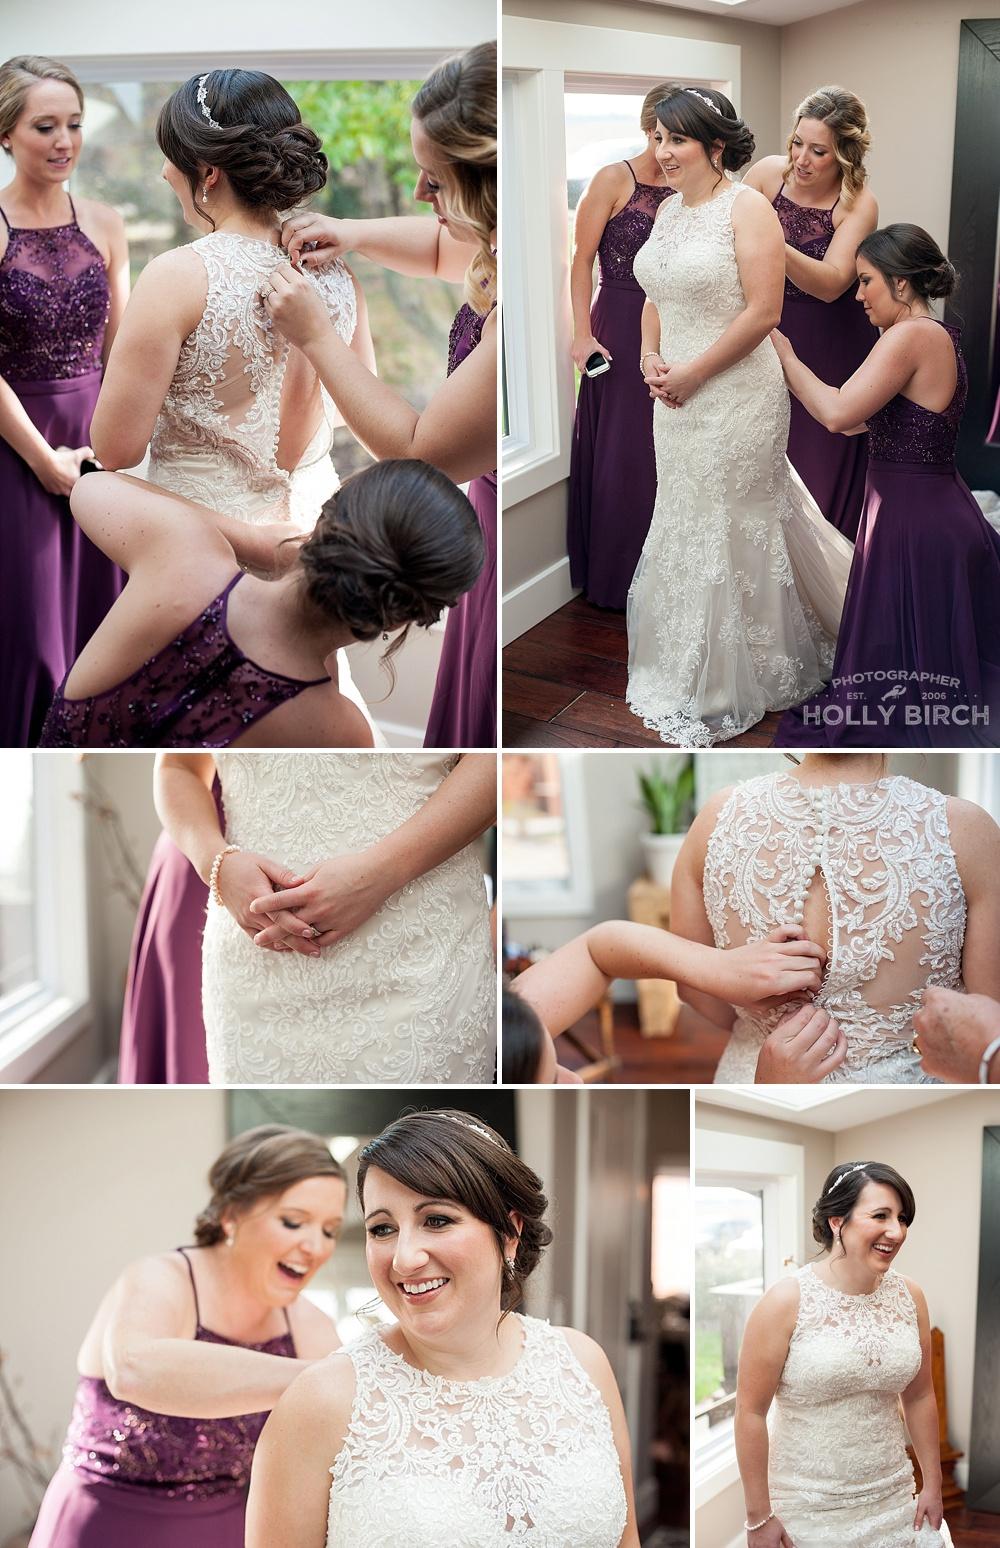 buttoning bride's dress